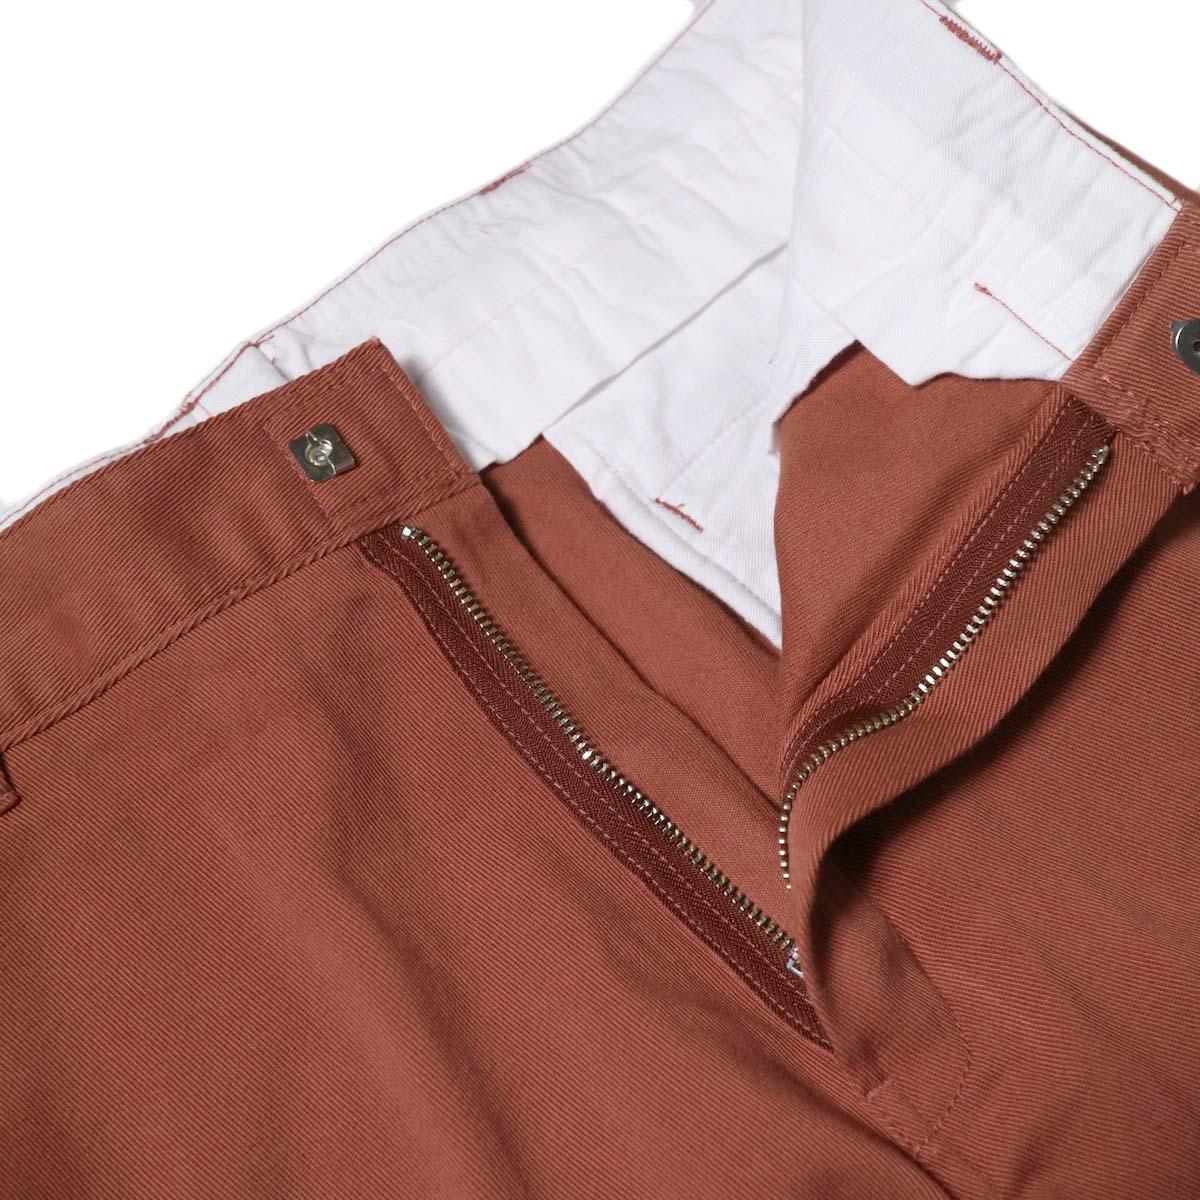 UNUSED × Dickies / UW0939 Cotton Linen Trousers (Orange)  TALONファスナー